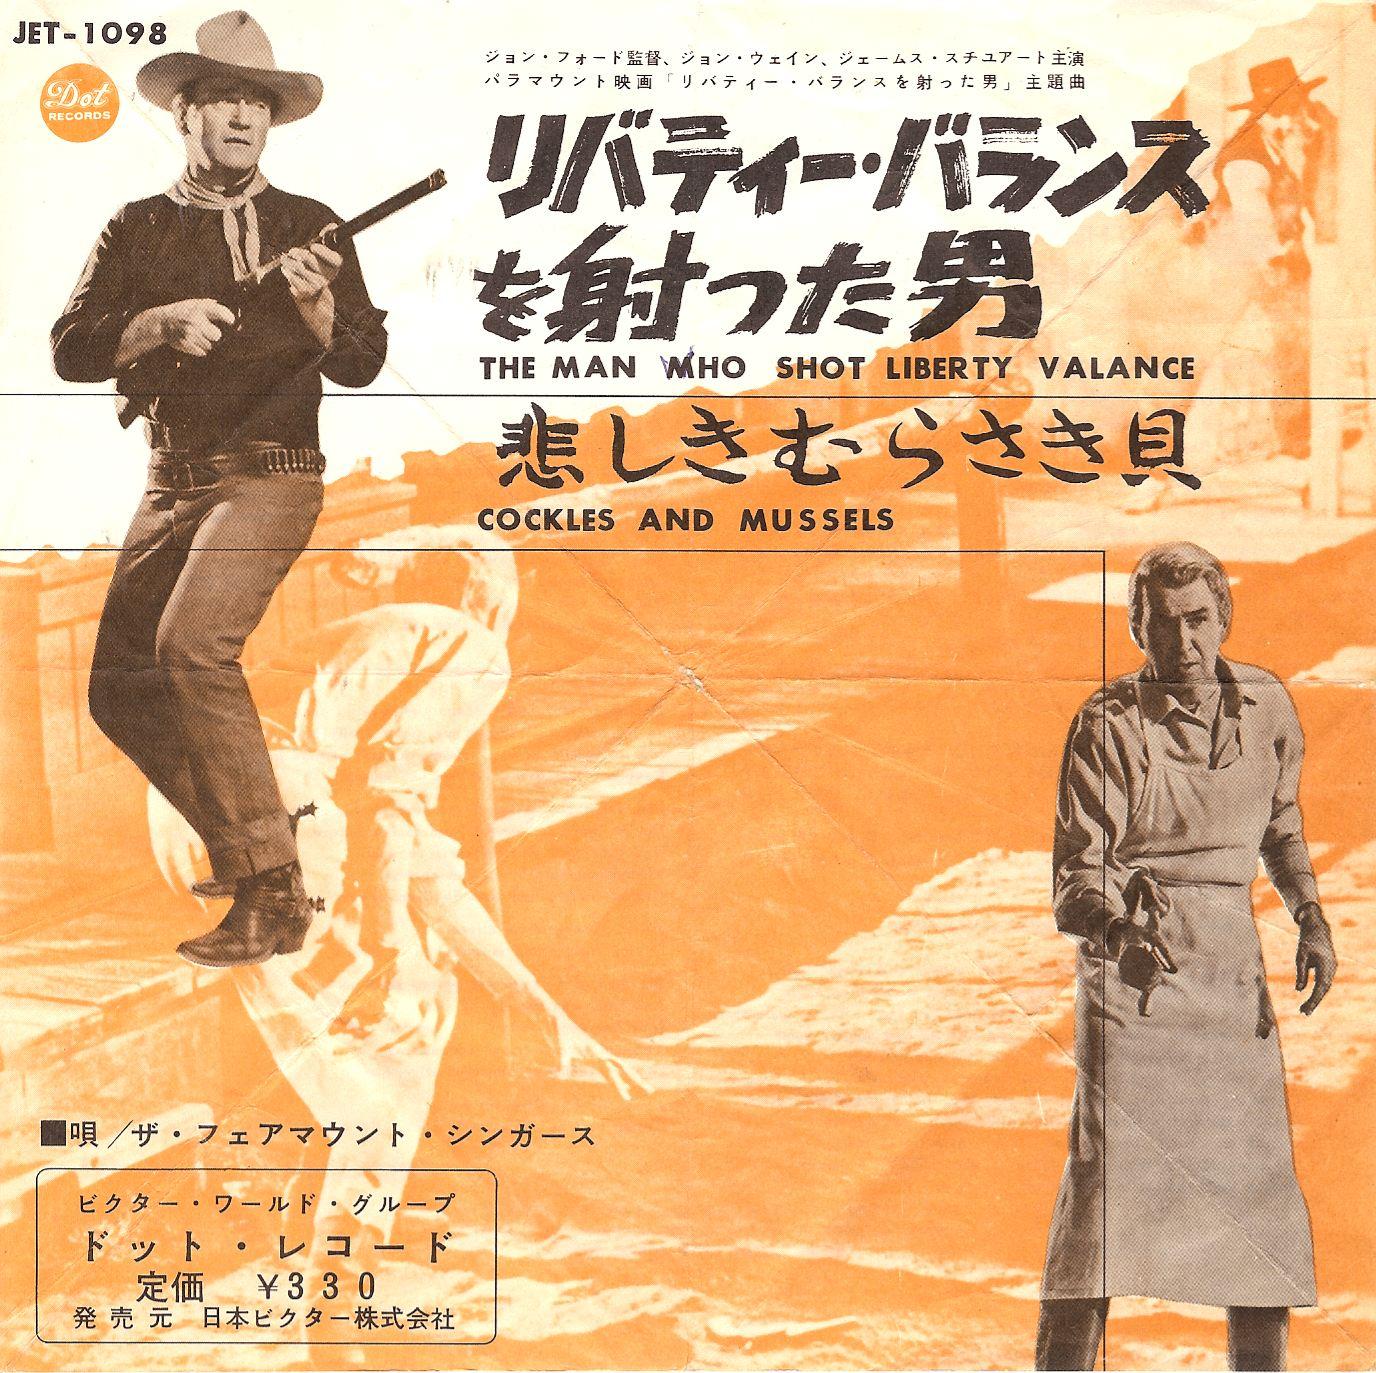 The Man Who Shot Liberty Valance Soundtrack